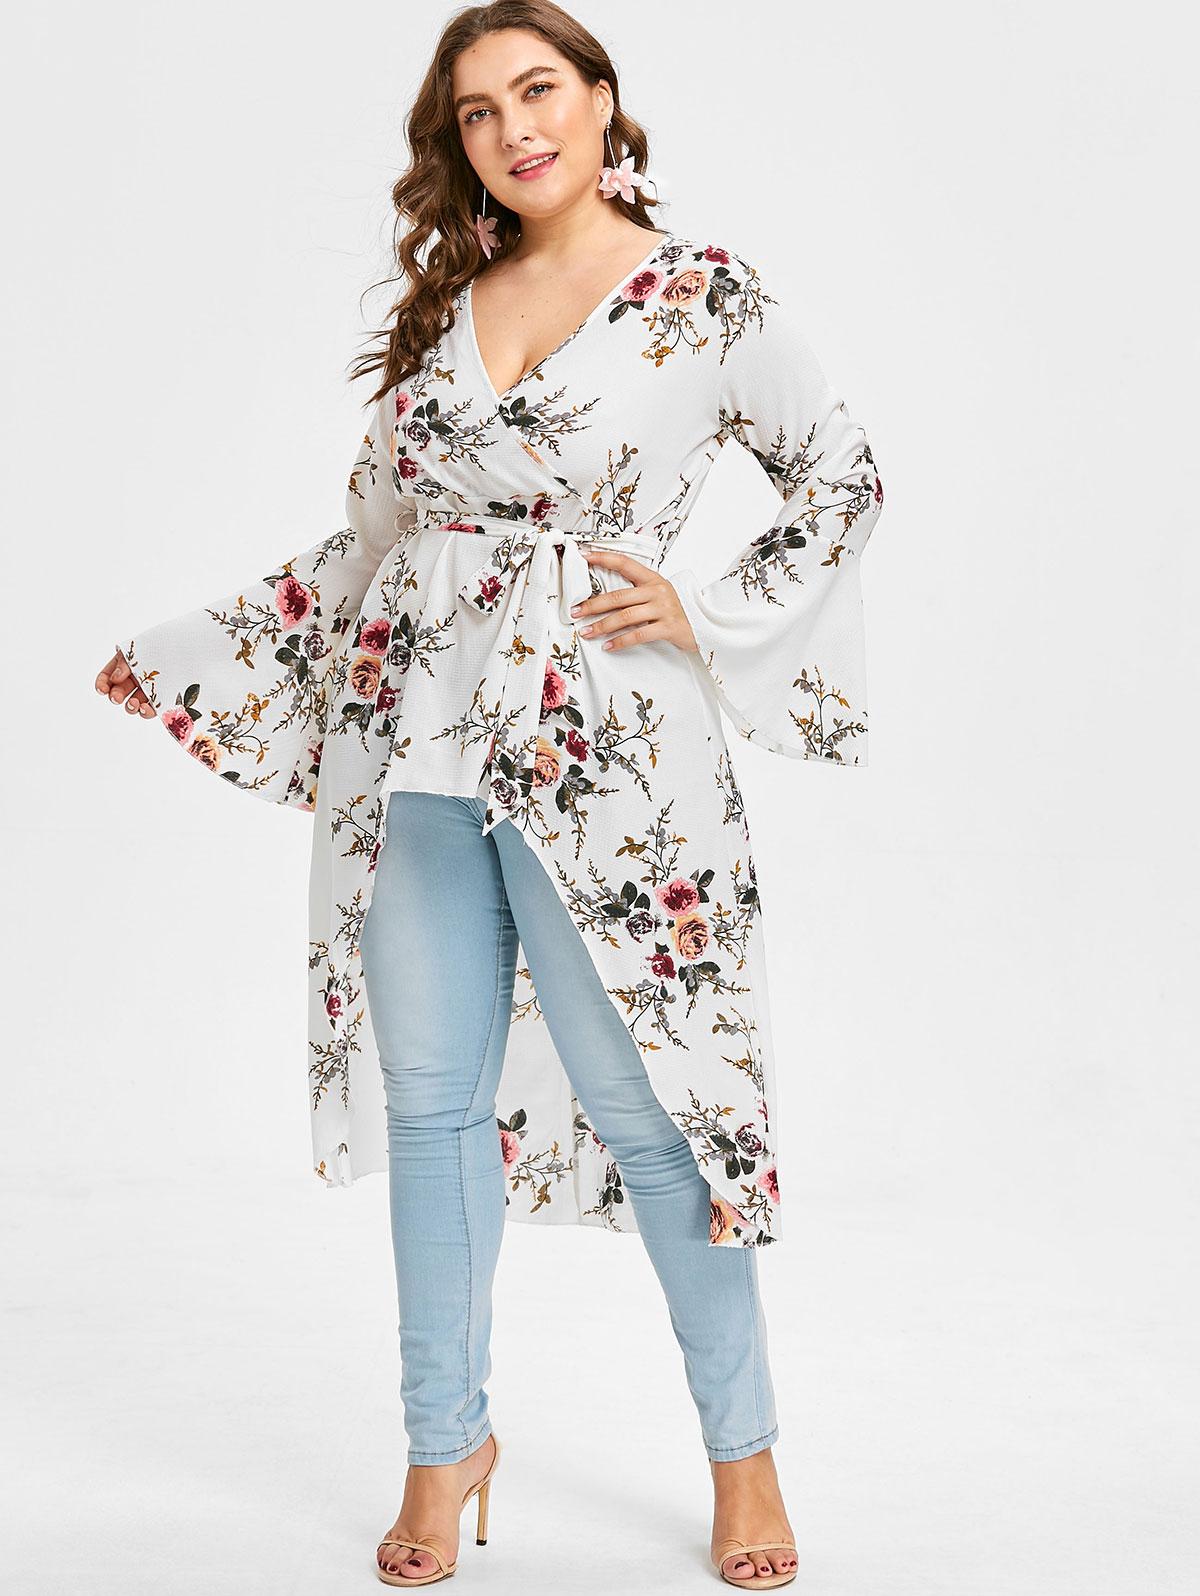 04dfc394a52 Wipalo Plus Size 4XL Flower Bell Sleeve Blouse Women V Neck Long Sleeve Long  Tops Blouses